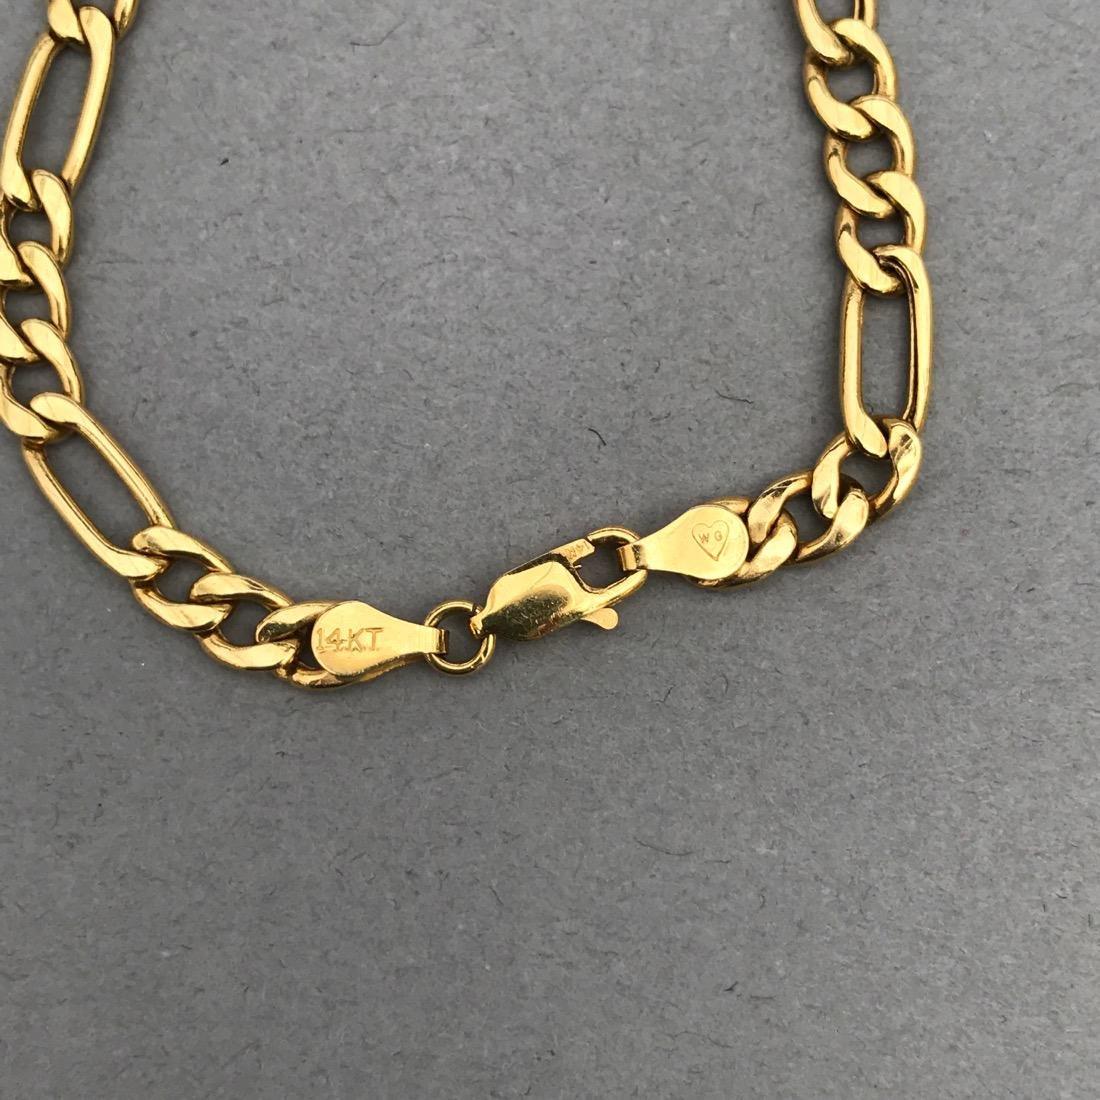 14K Gold Chain Link Bracelet - 3